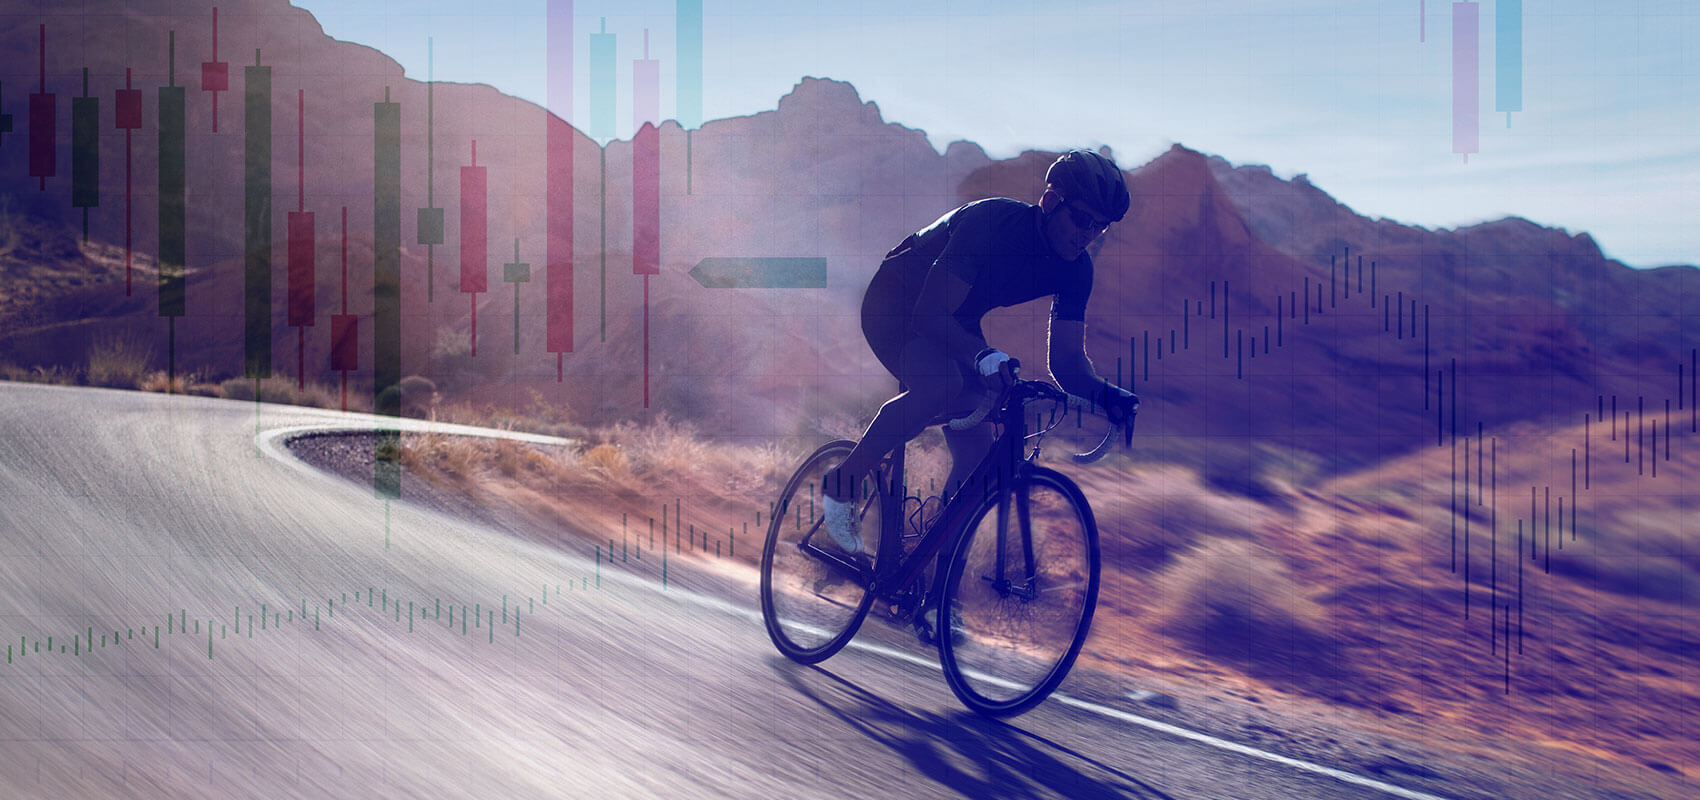 https://exinity.com/sites/default/files/revslider/image/banner-tradeup-cycling.jpg